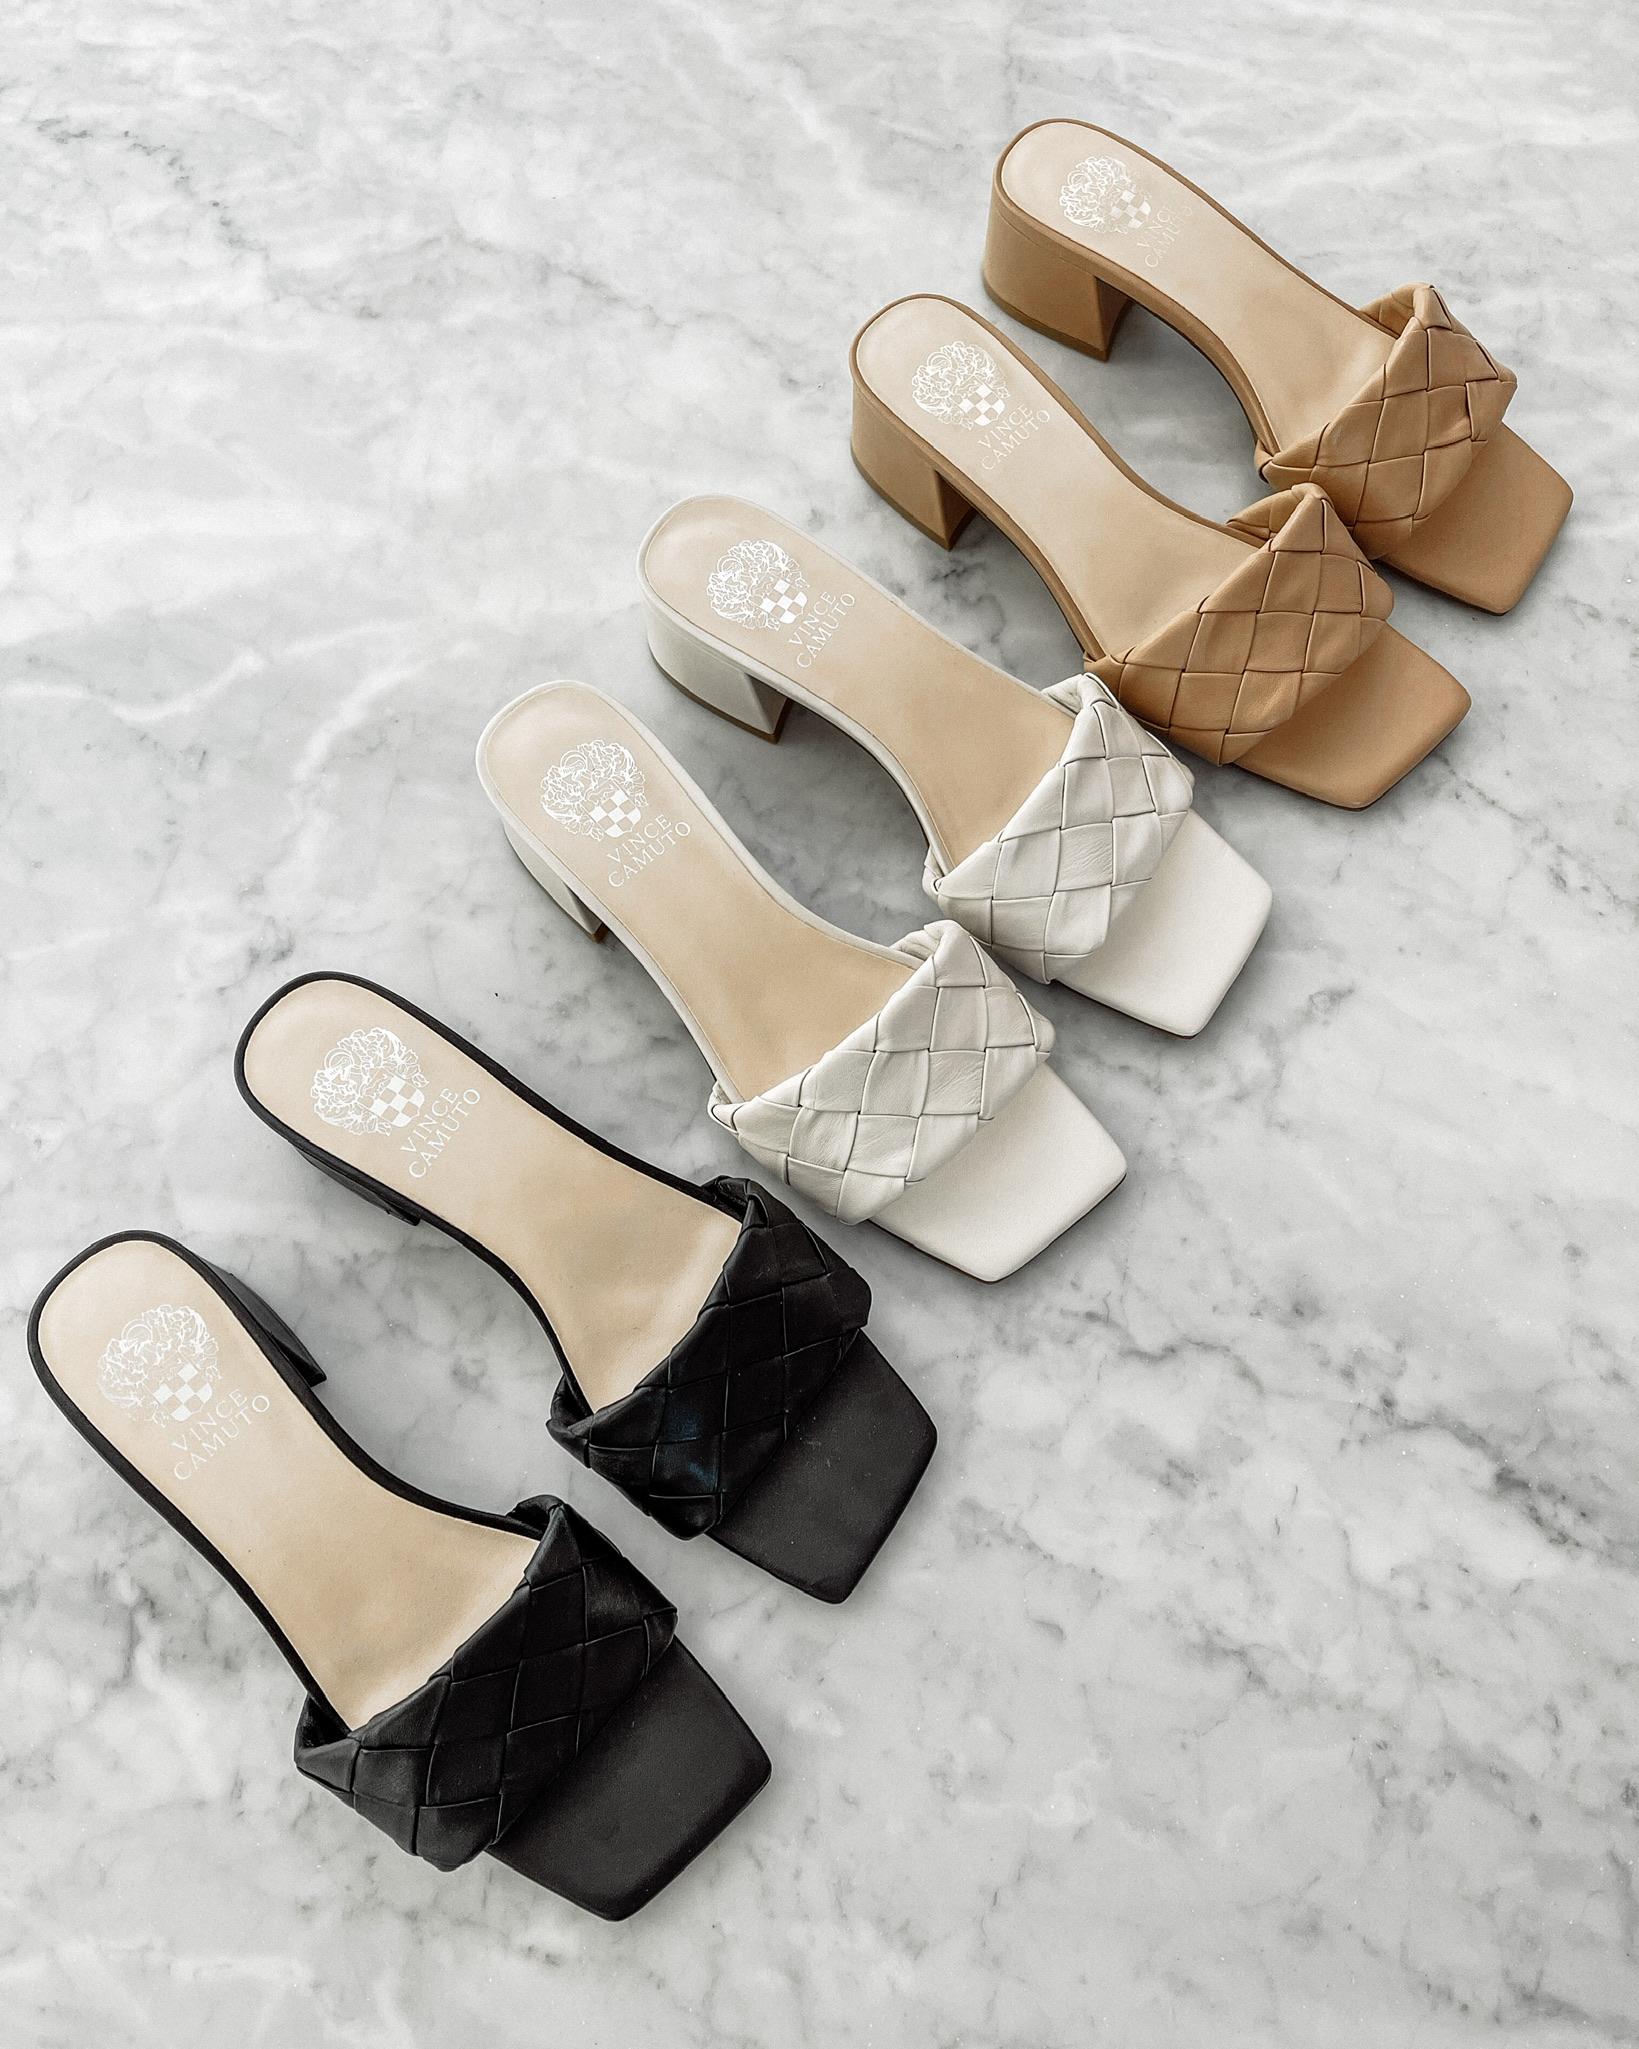 Fashion Jackson Vince Camuto Semtera Sandals